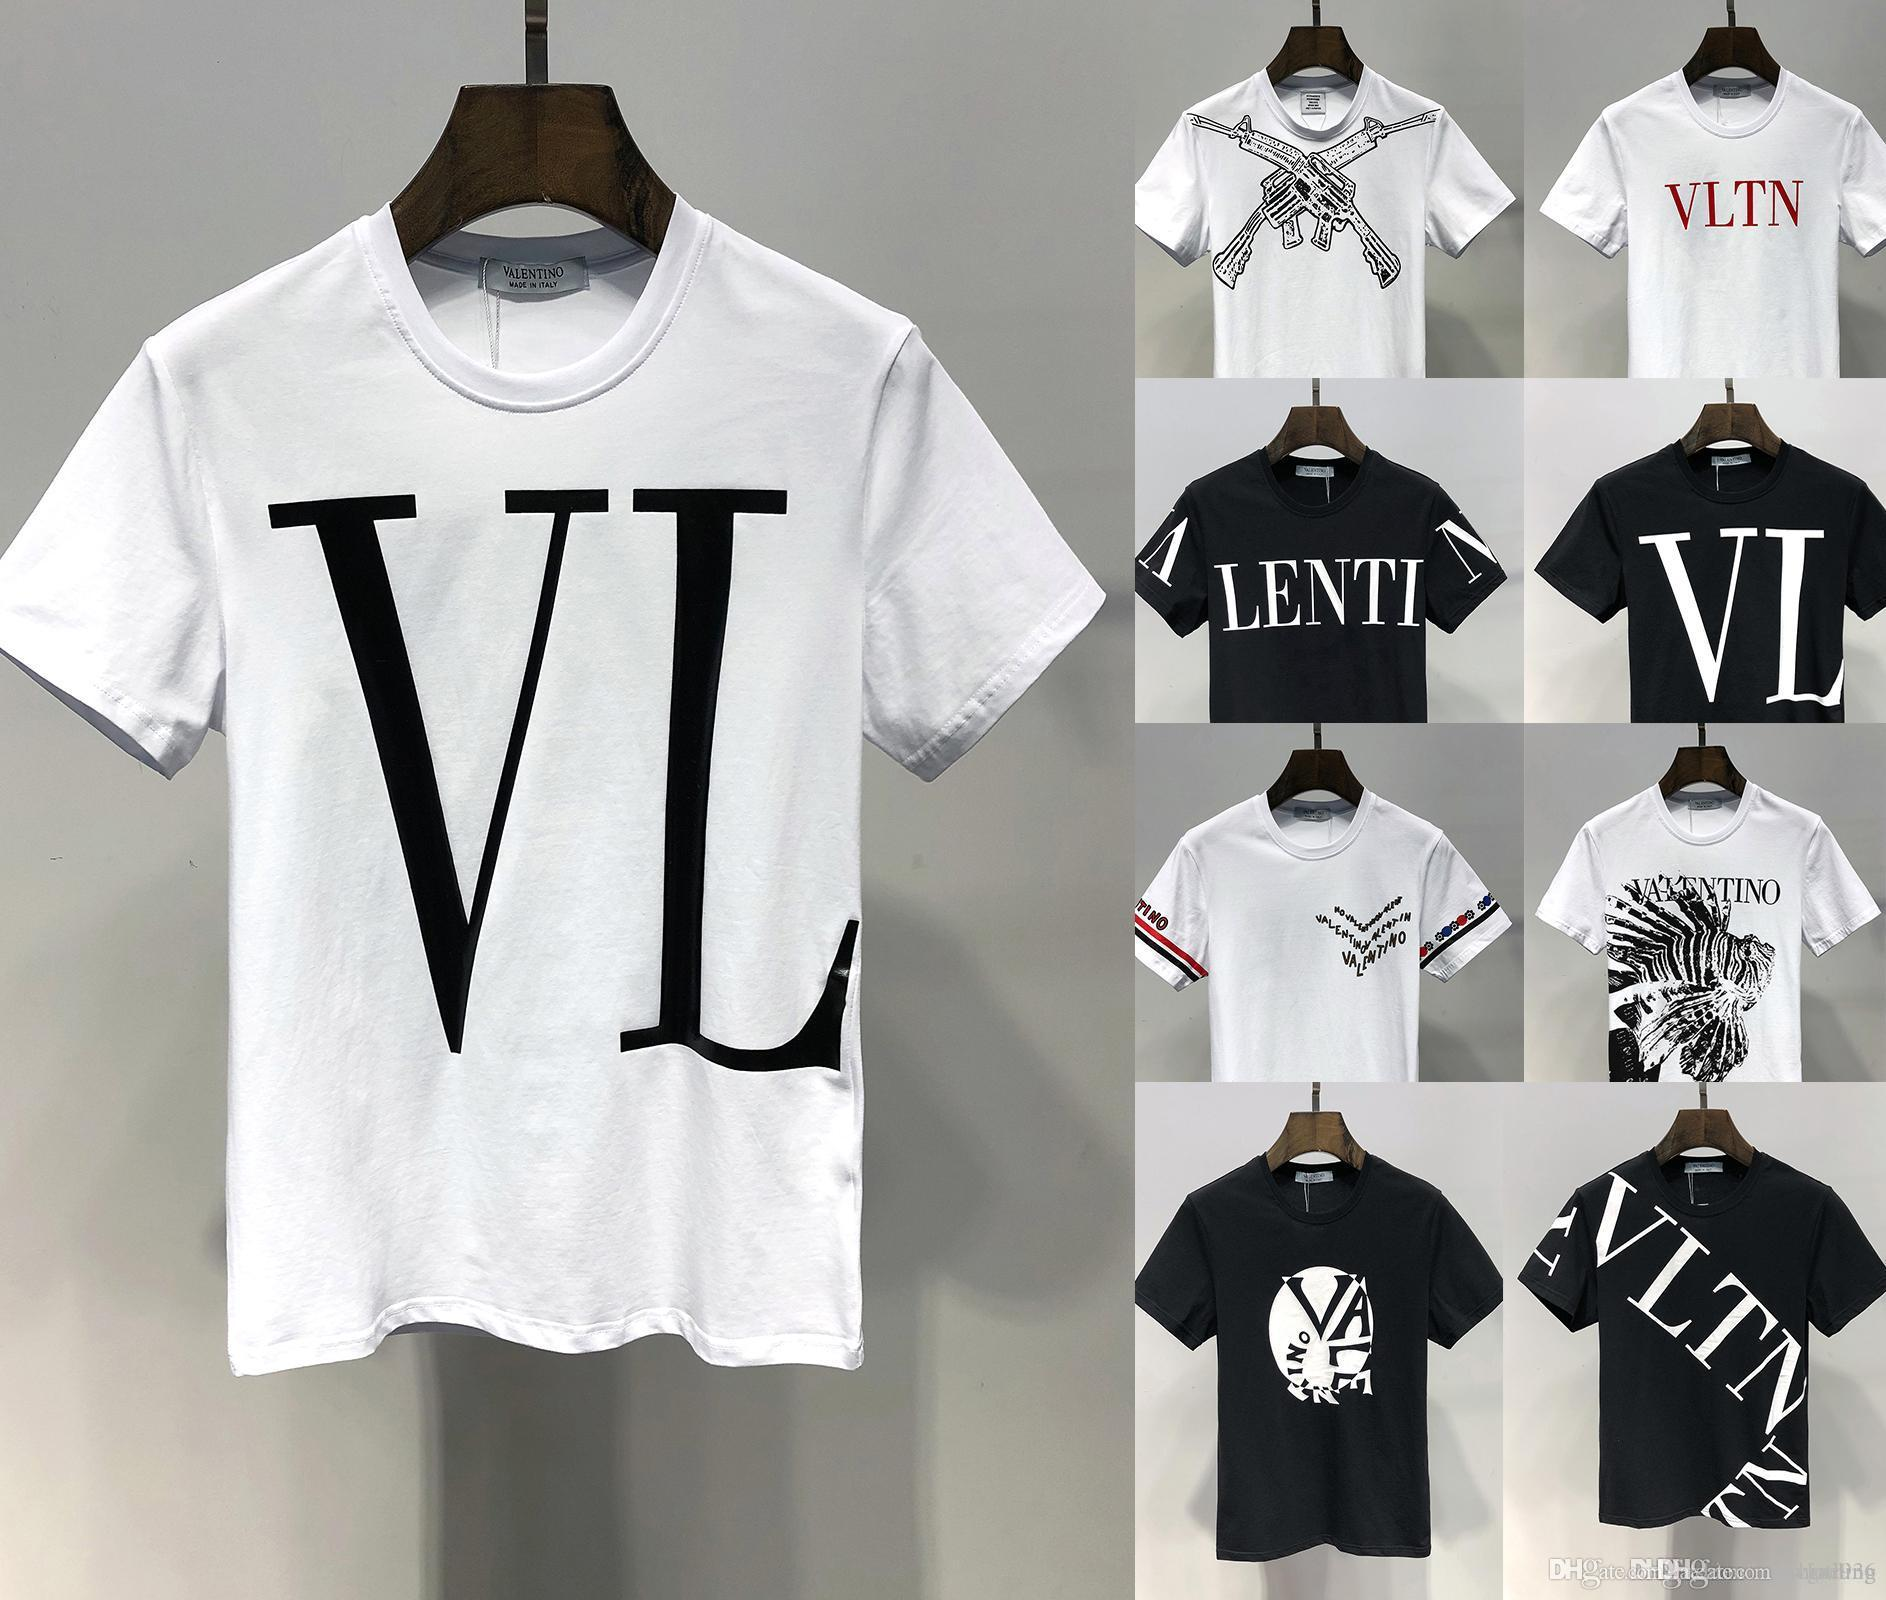 61c92cd3 2019 VT 26 Styles Fashion Luxury T Shirts Men Fashion Polo Shirt Shirt Men  High Street Snake Little Bee Tiger Print Mens Polo Shirt Best Tshirts Cool T  ...